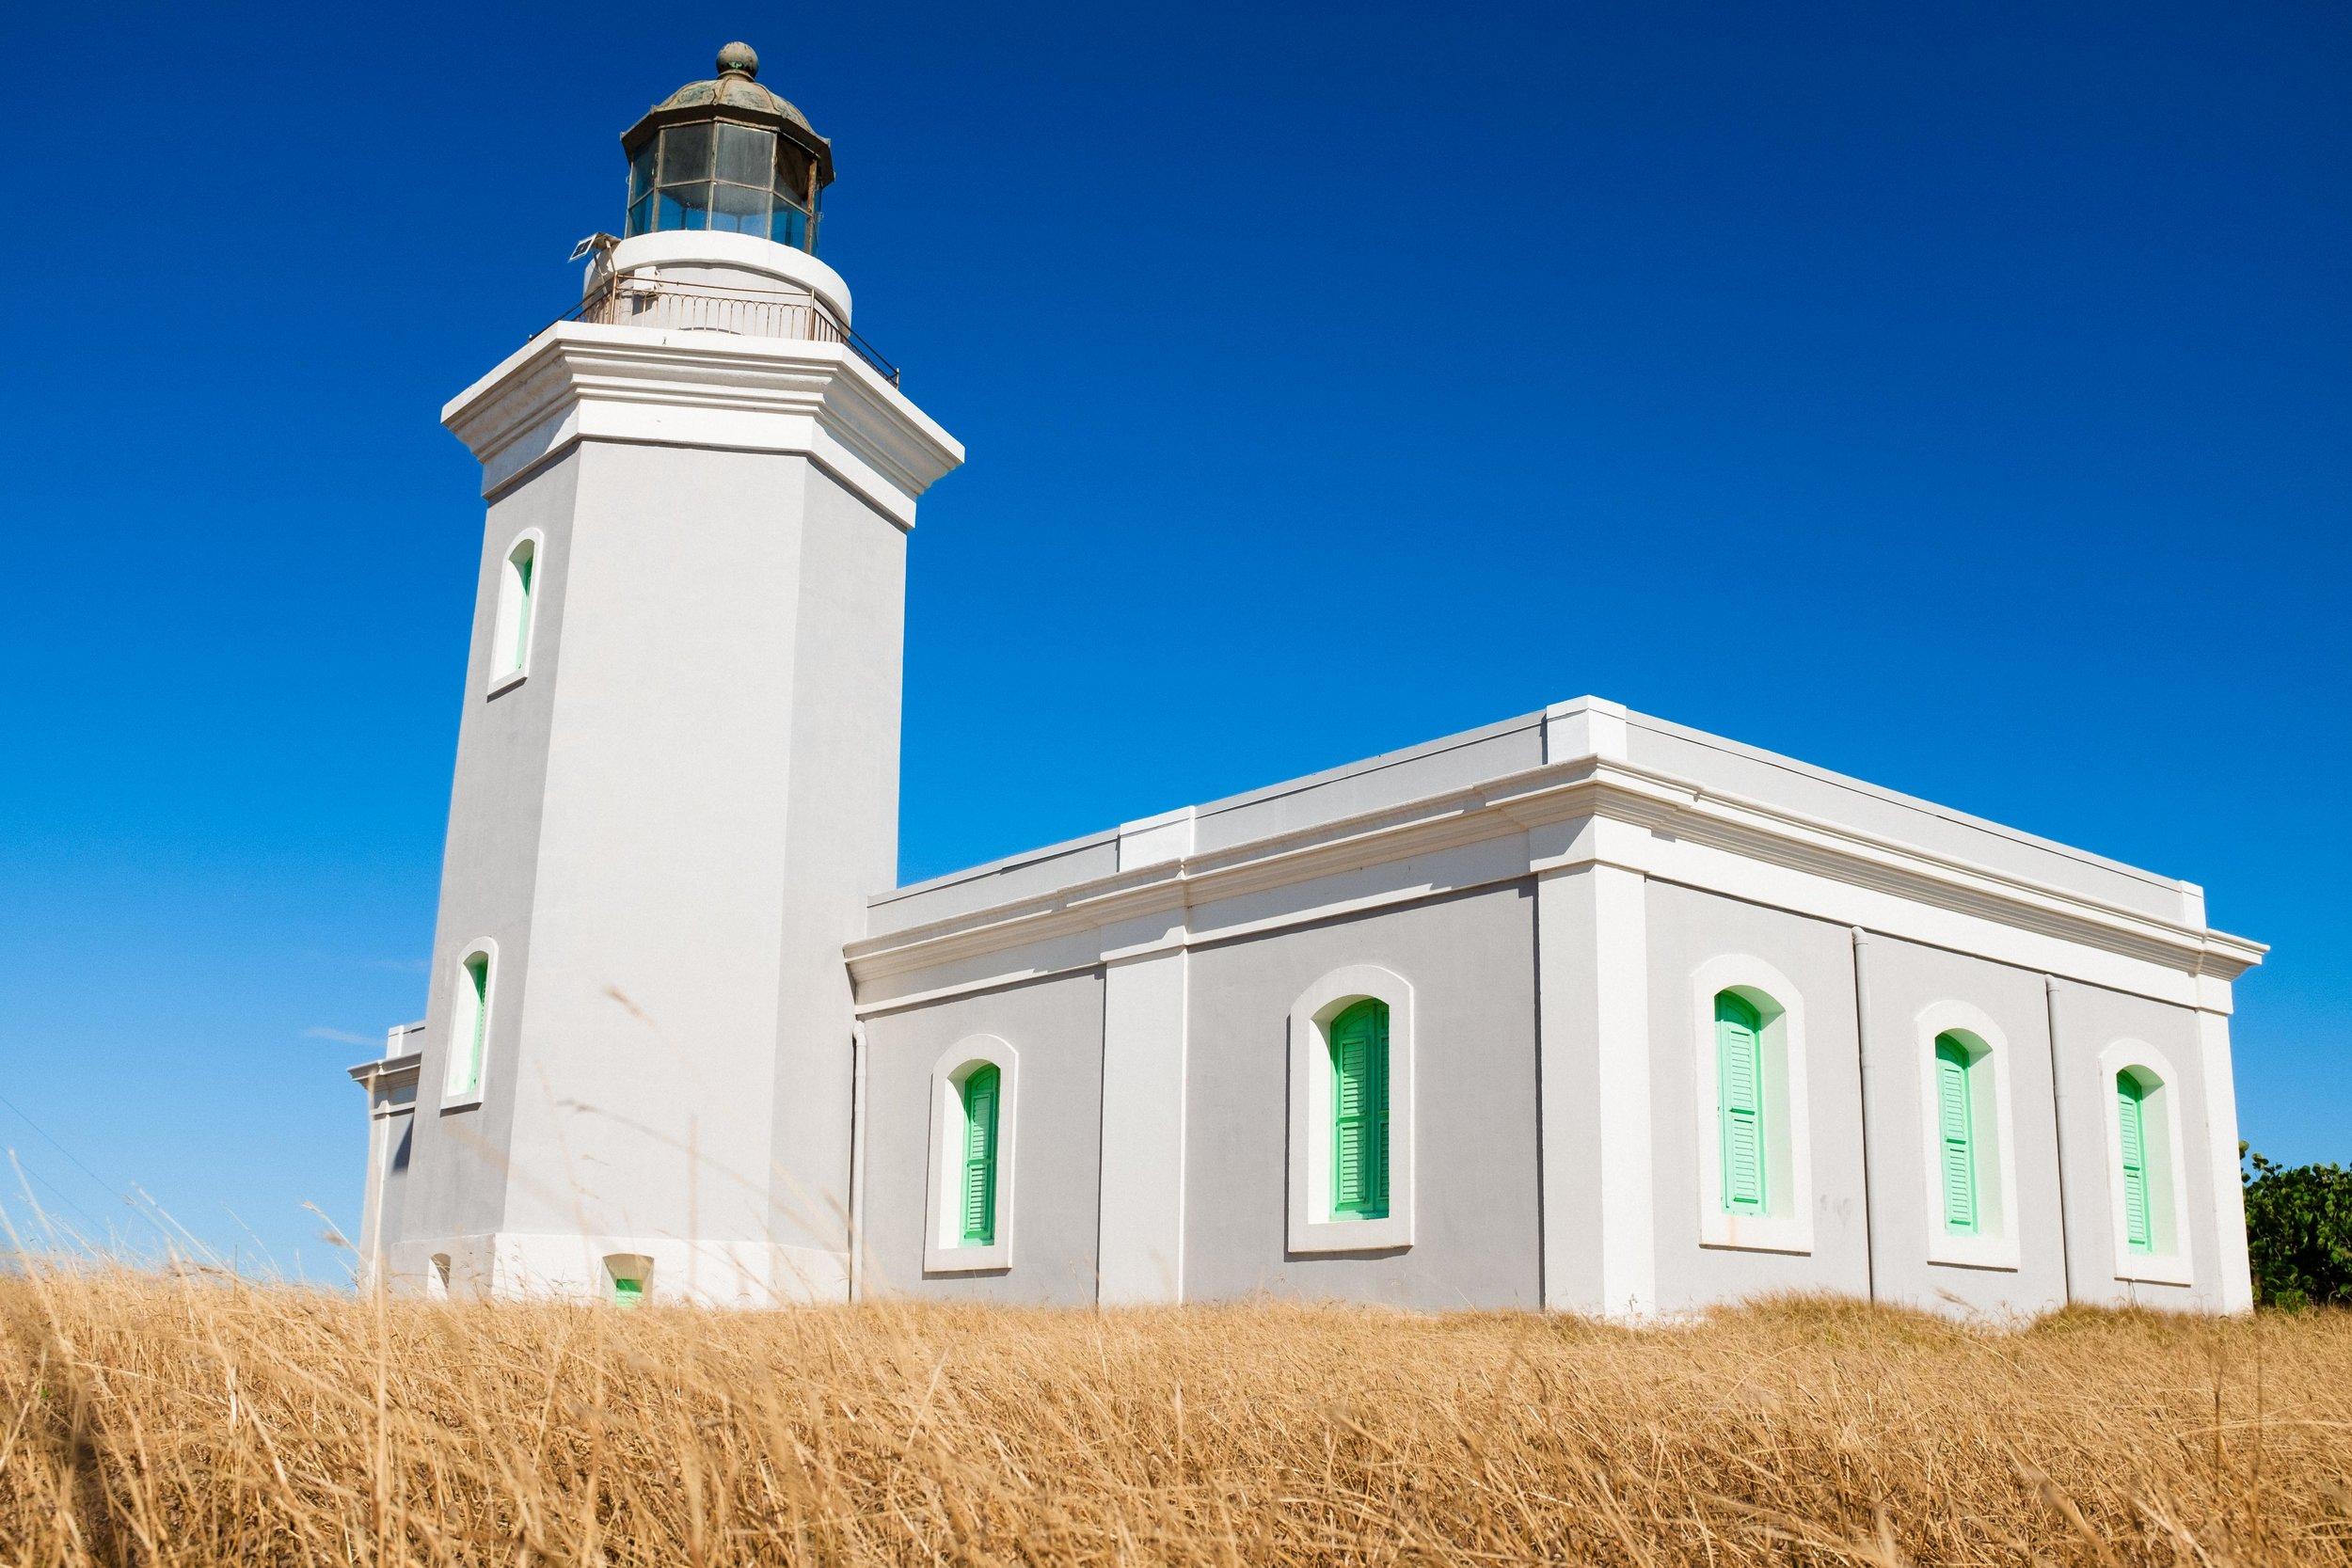 puerto-rico-cabo-rojo-lighthouse-7034.jpg